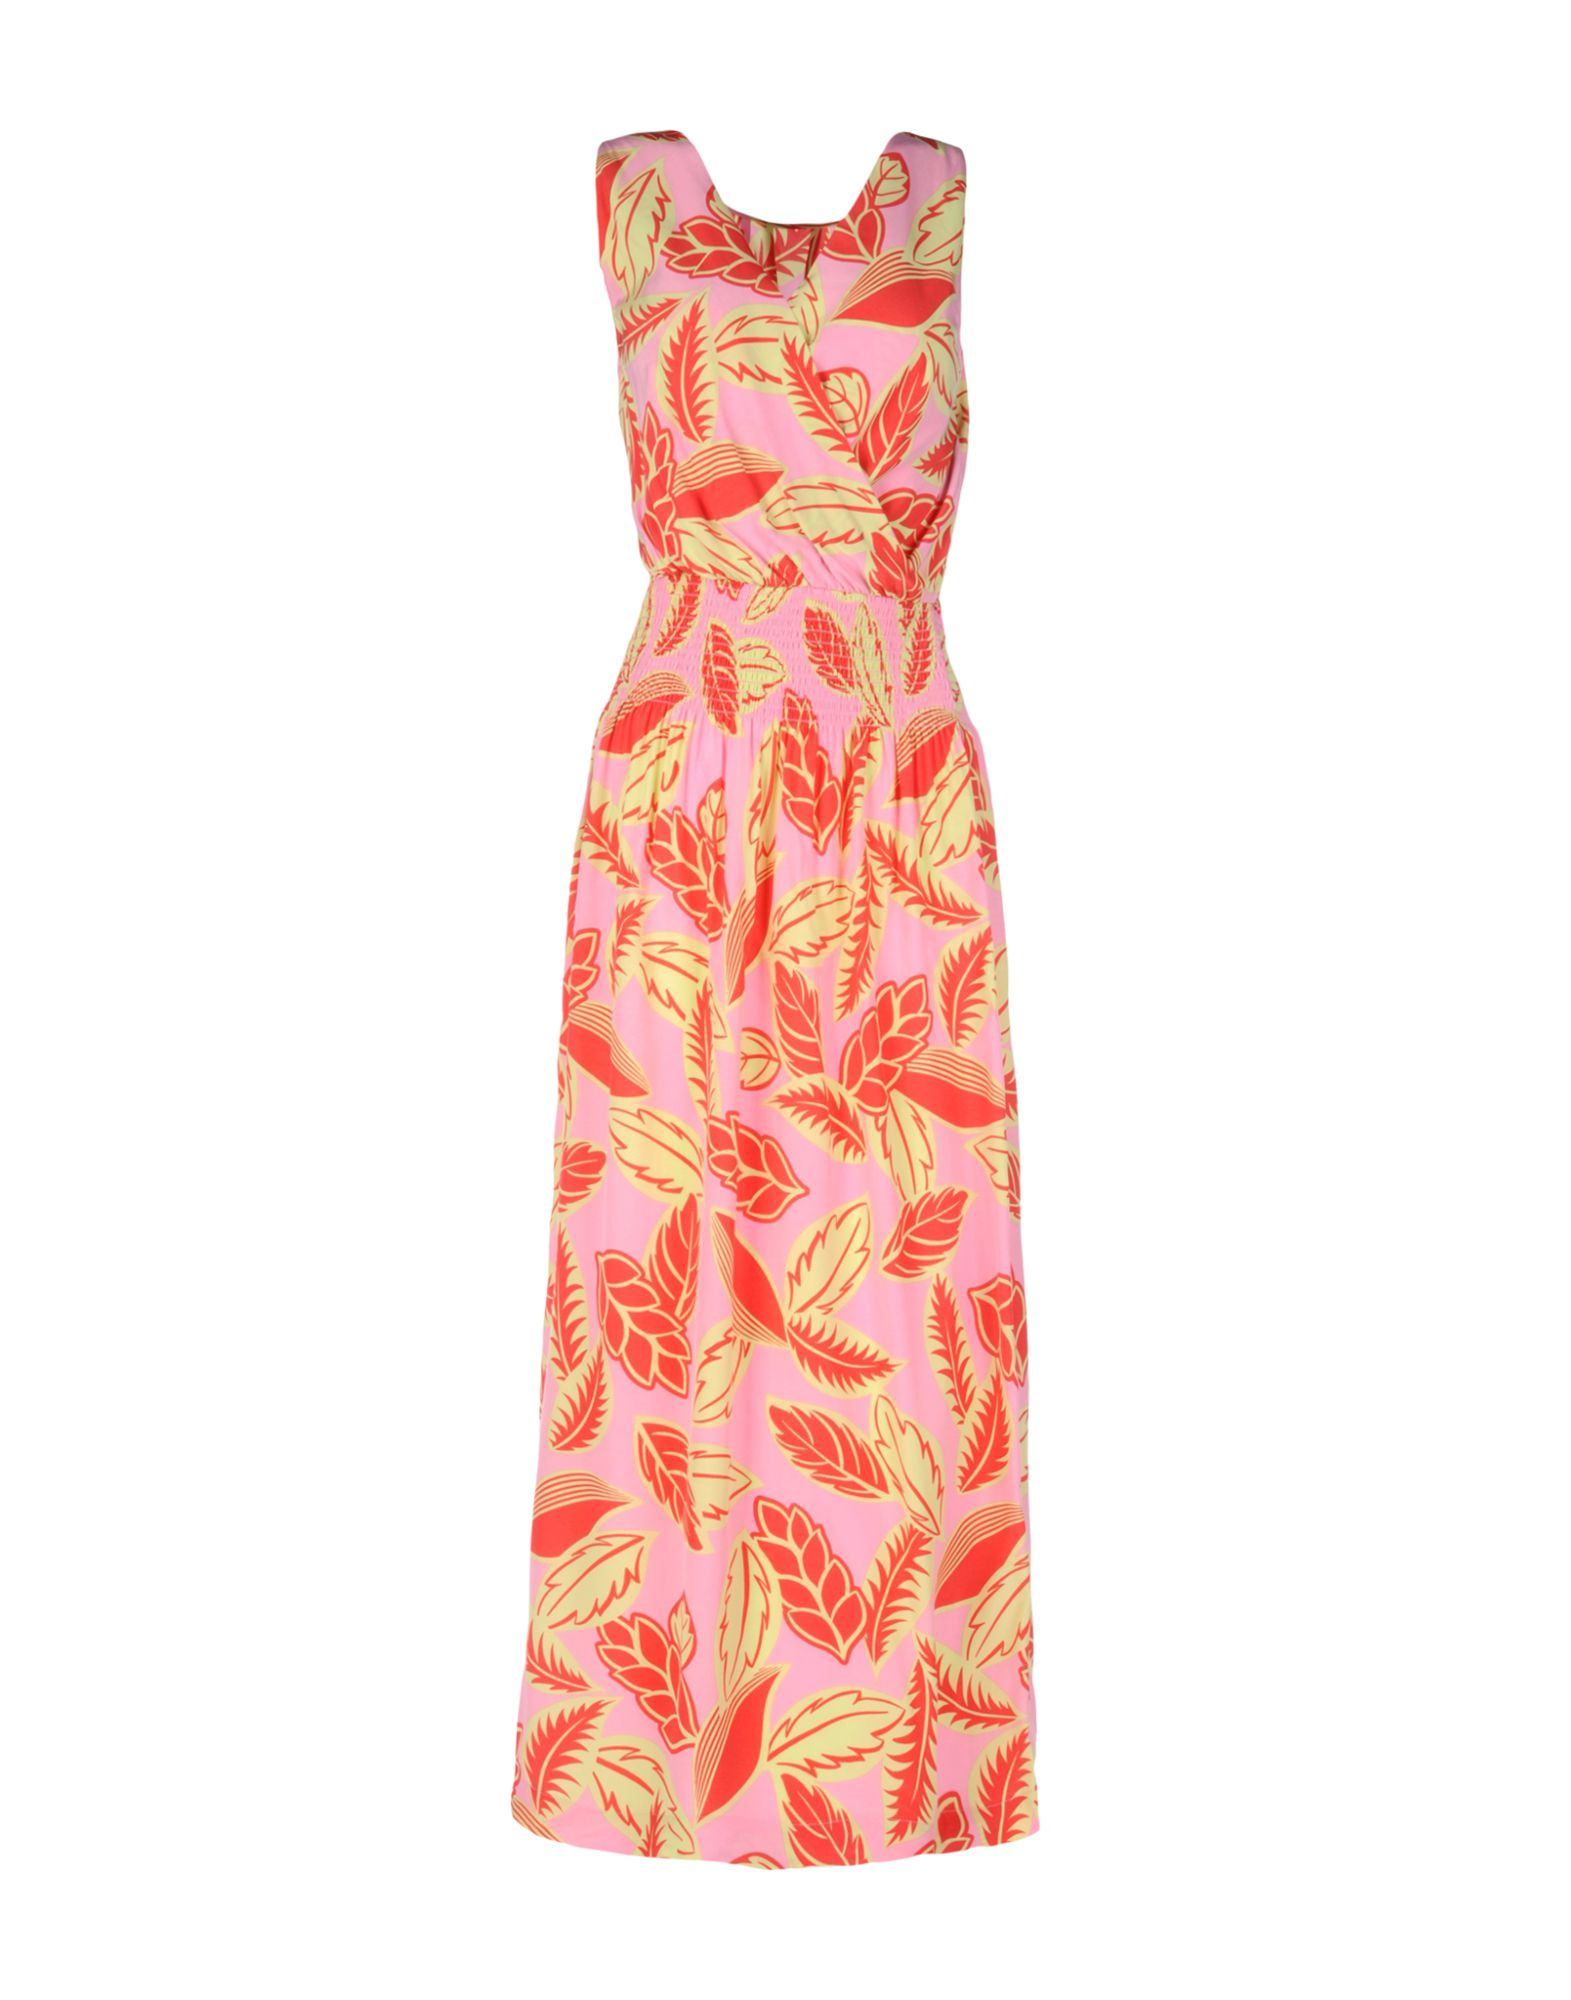 BOUTIQUE MOSCHINO Длинное платье clio peppiatt длинное платье